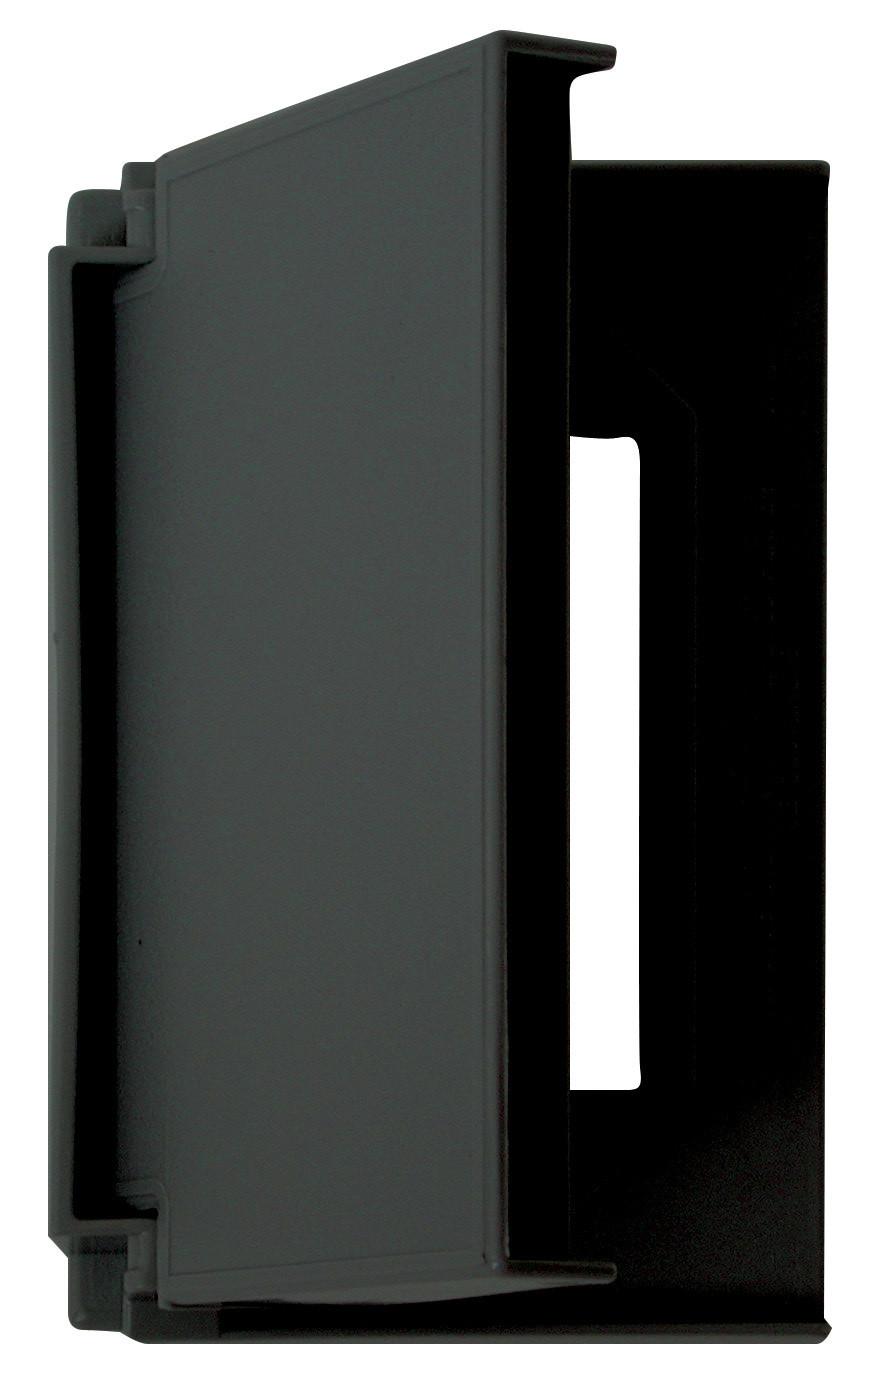 Weatherproof Decor Cover - Black